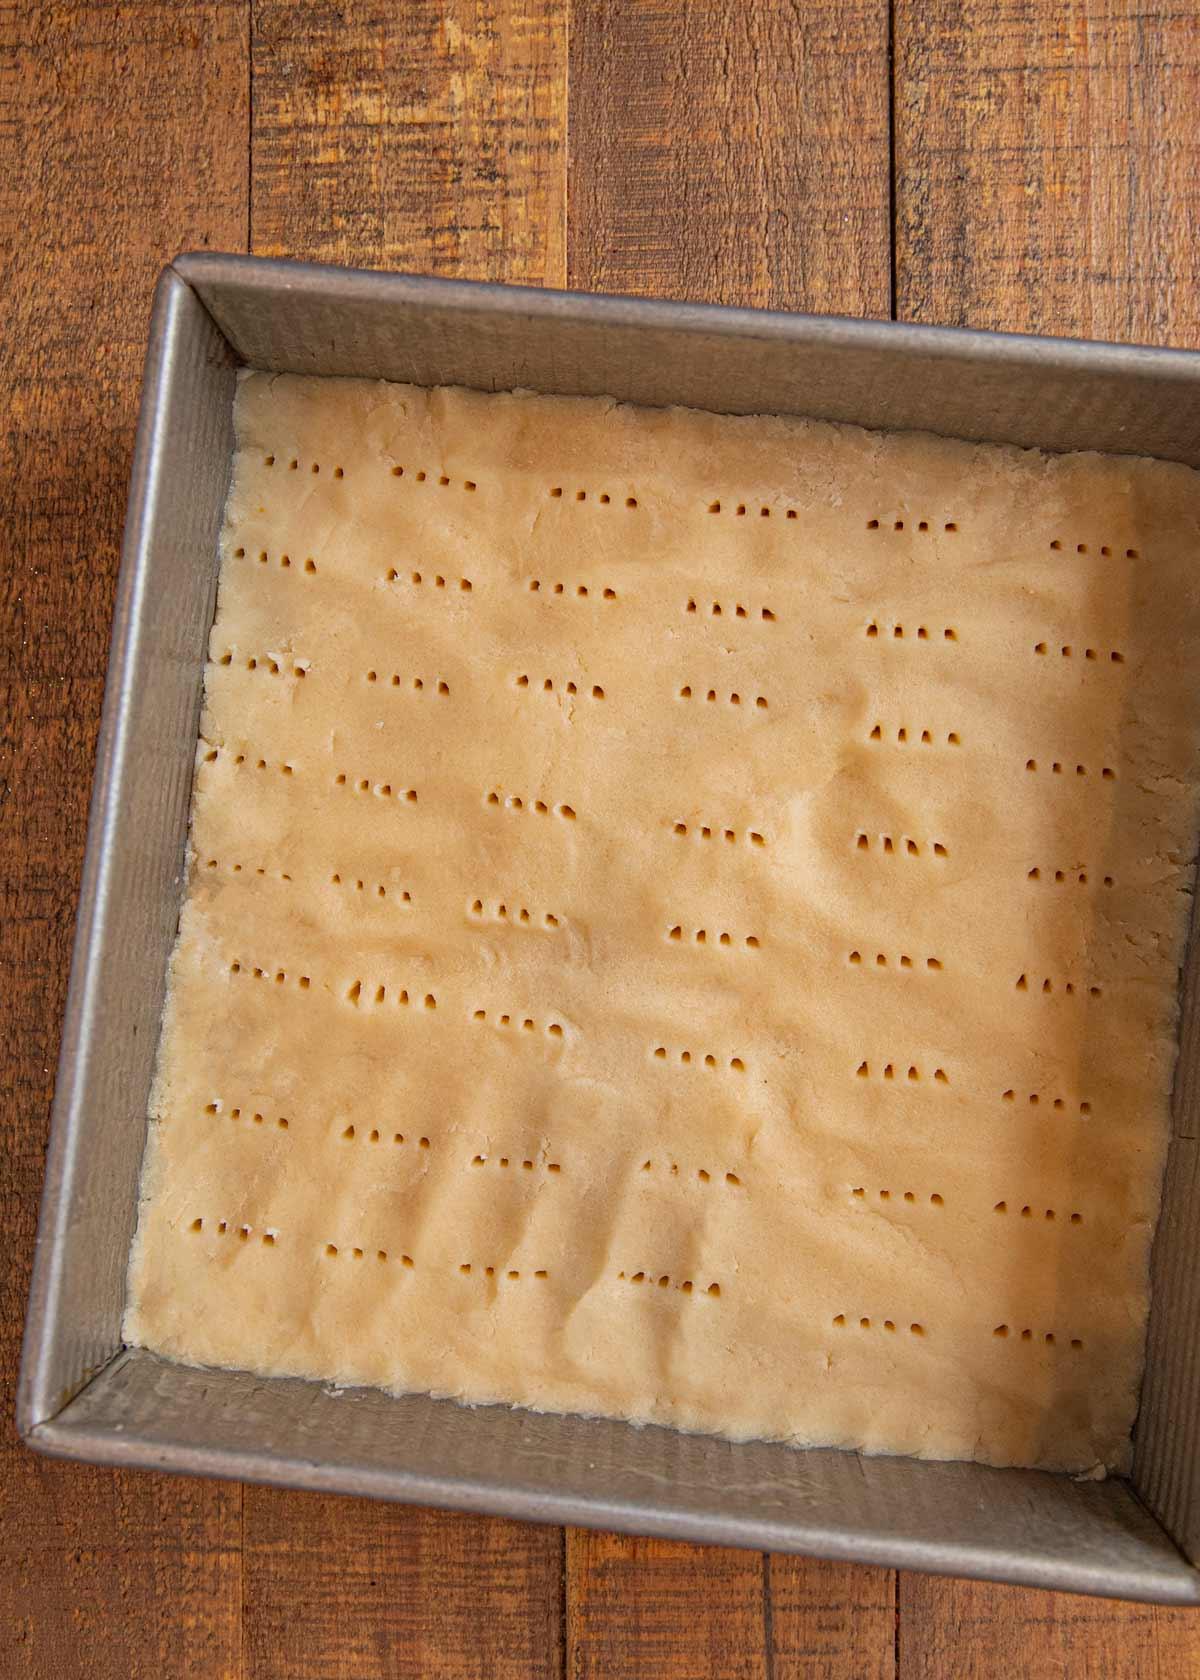 Shortbread Cookies in baking pan before baking